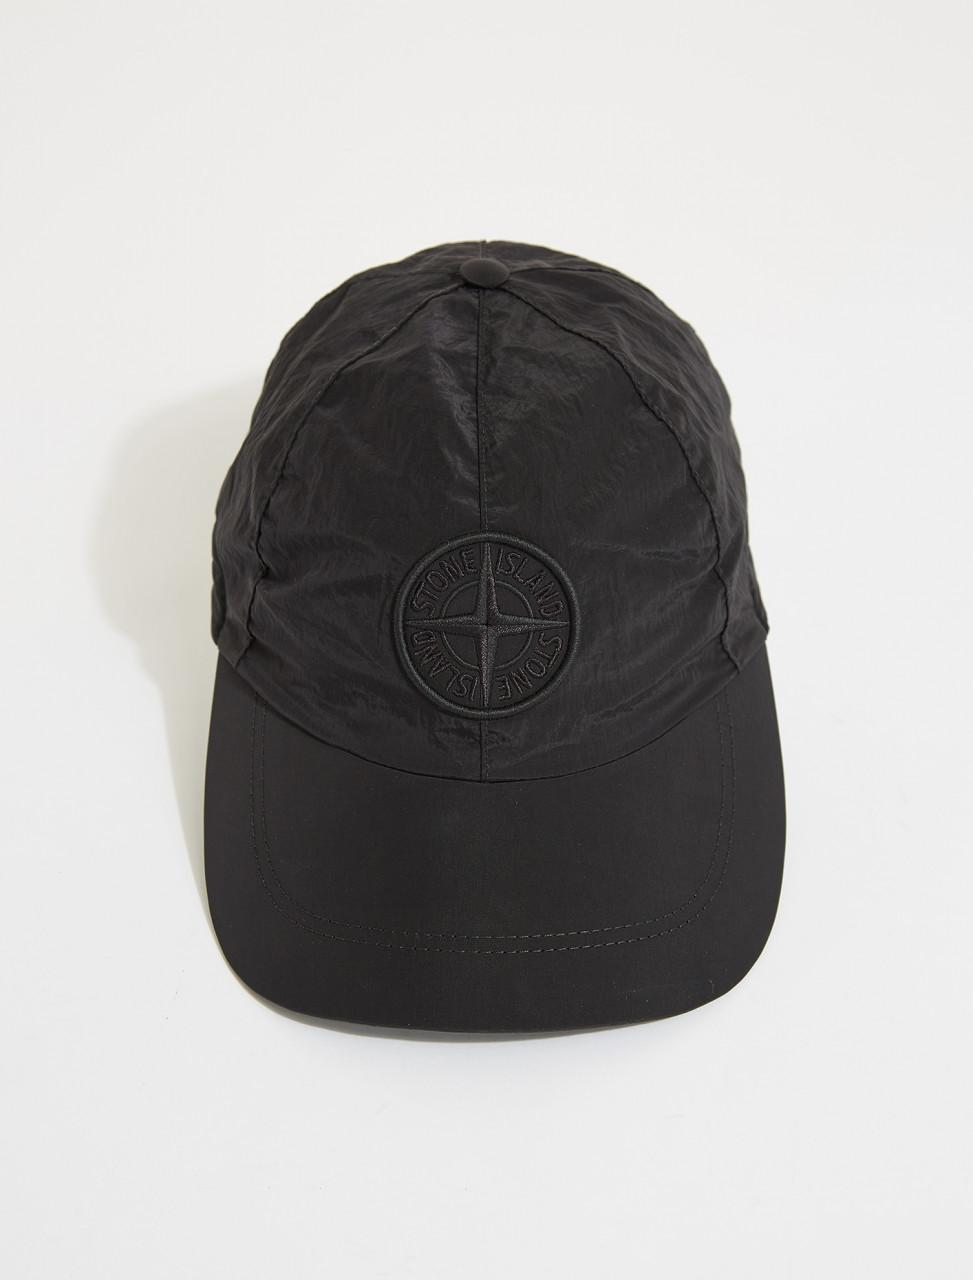 MO741599576-V0029 STONE ISLAND CAP BLACK